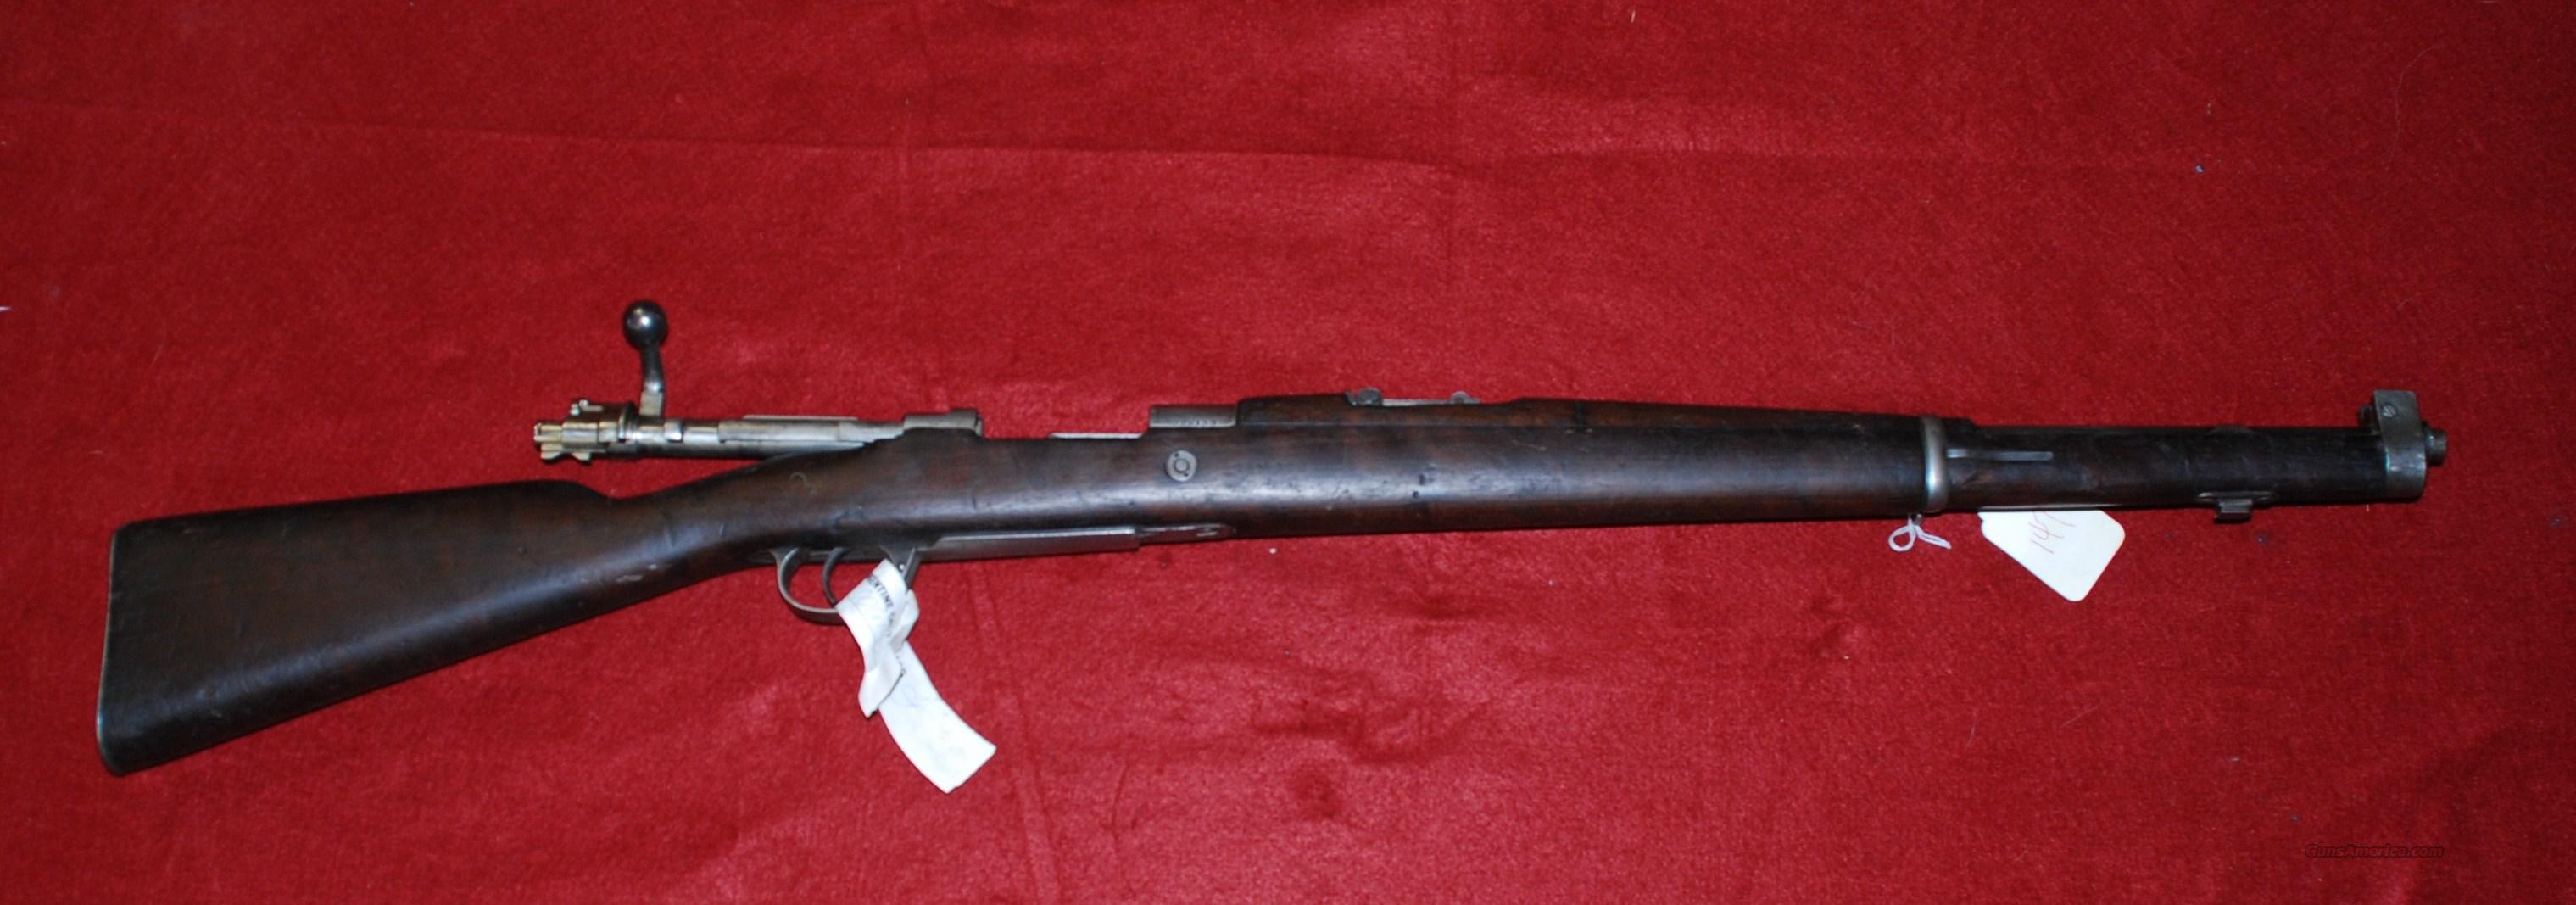 Argentine Modelo 1909 Cavalry Carbine 7 65 Argentine